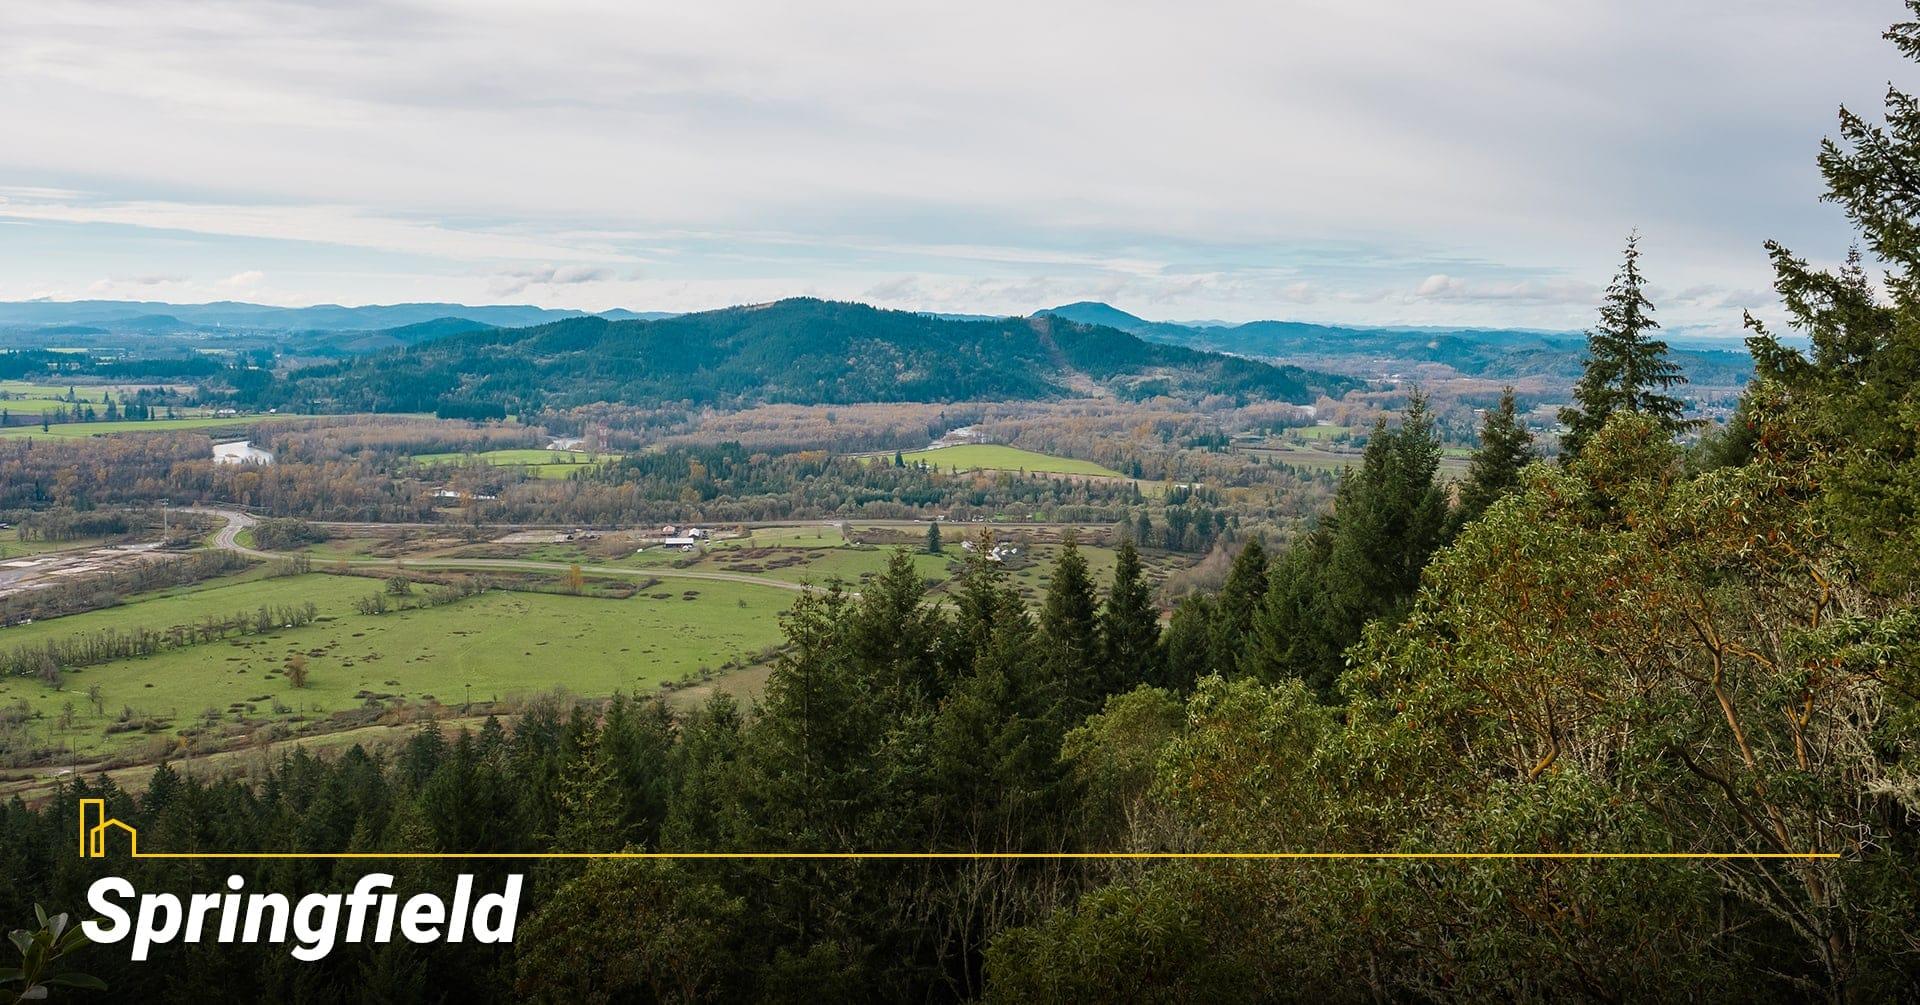 Springfield city in Oregon